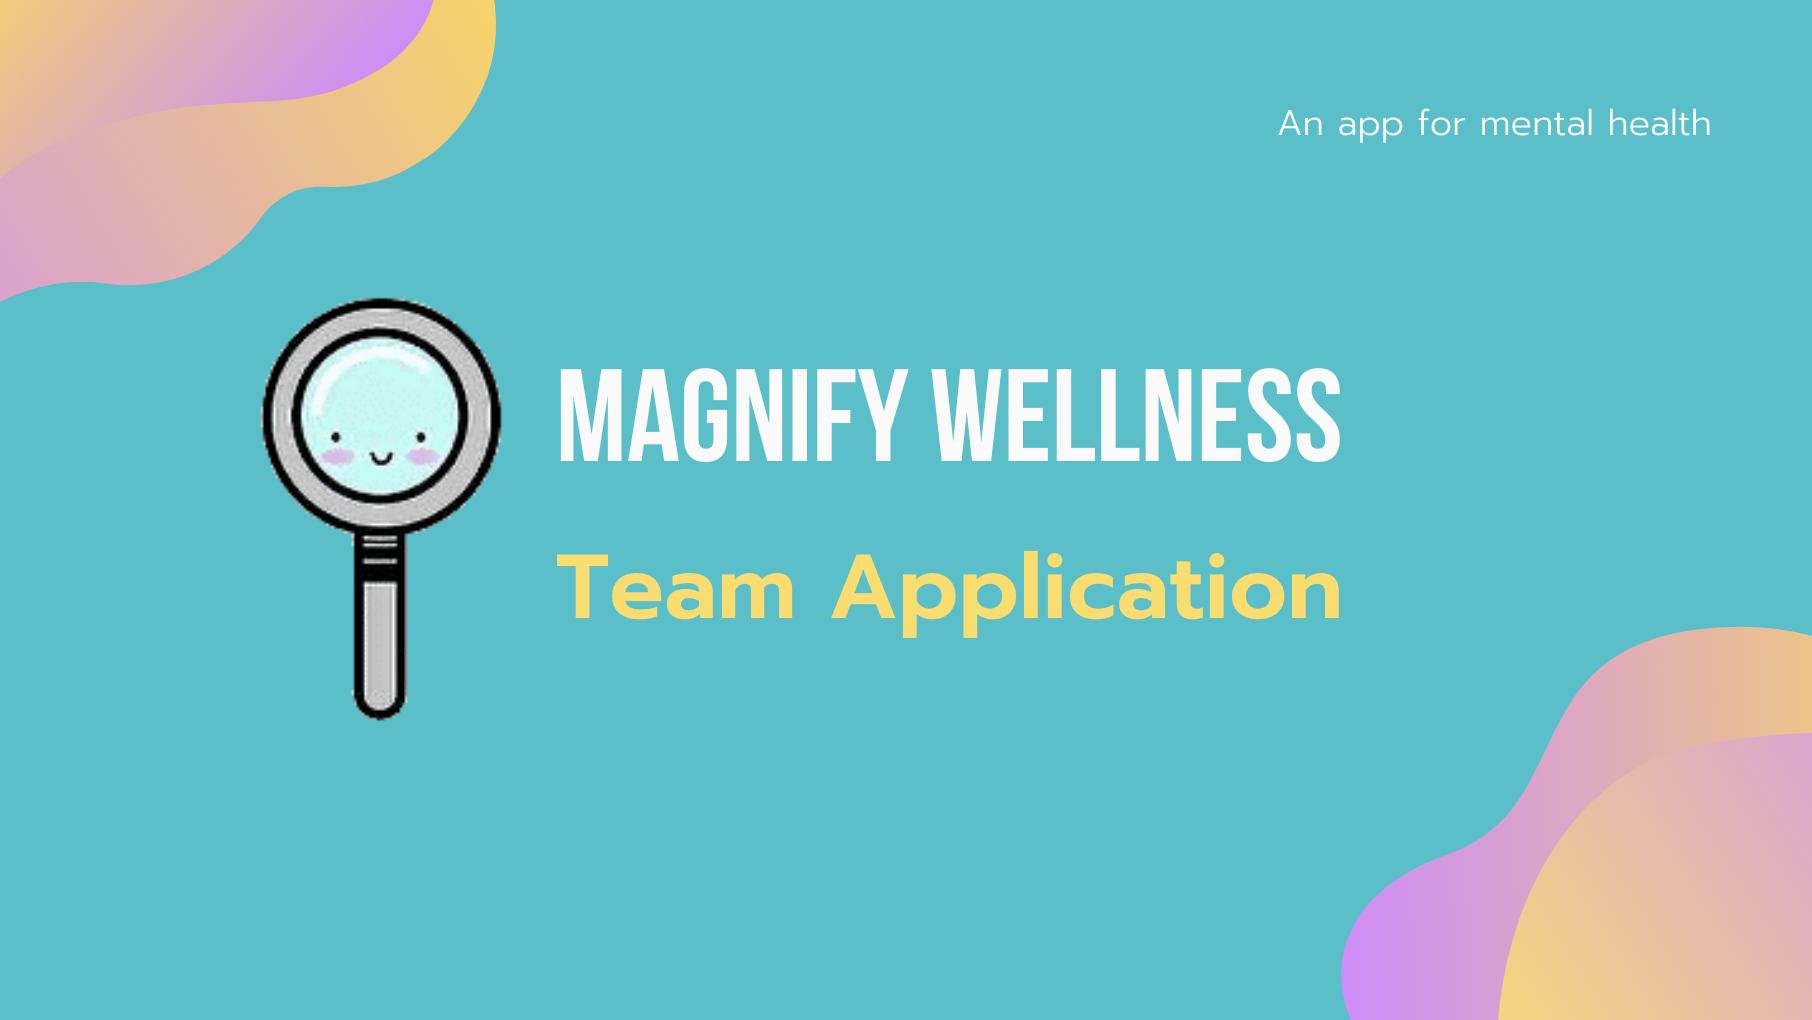 Magnify Wellness Team Application